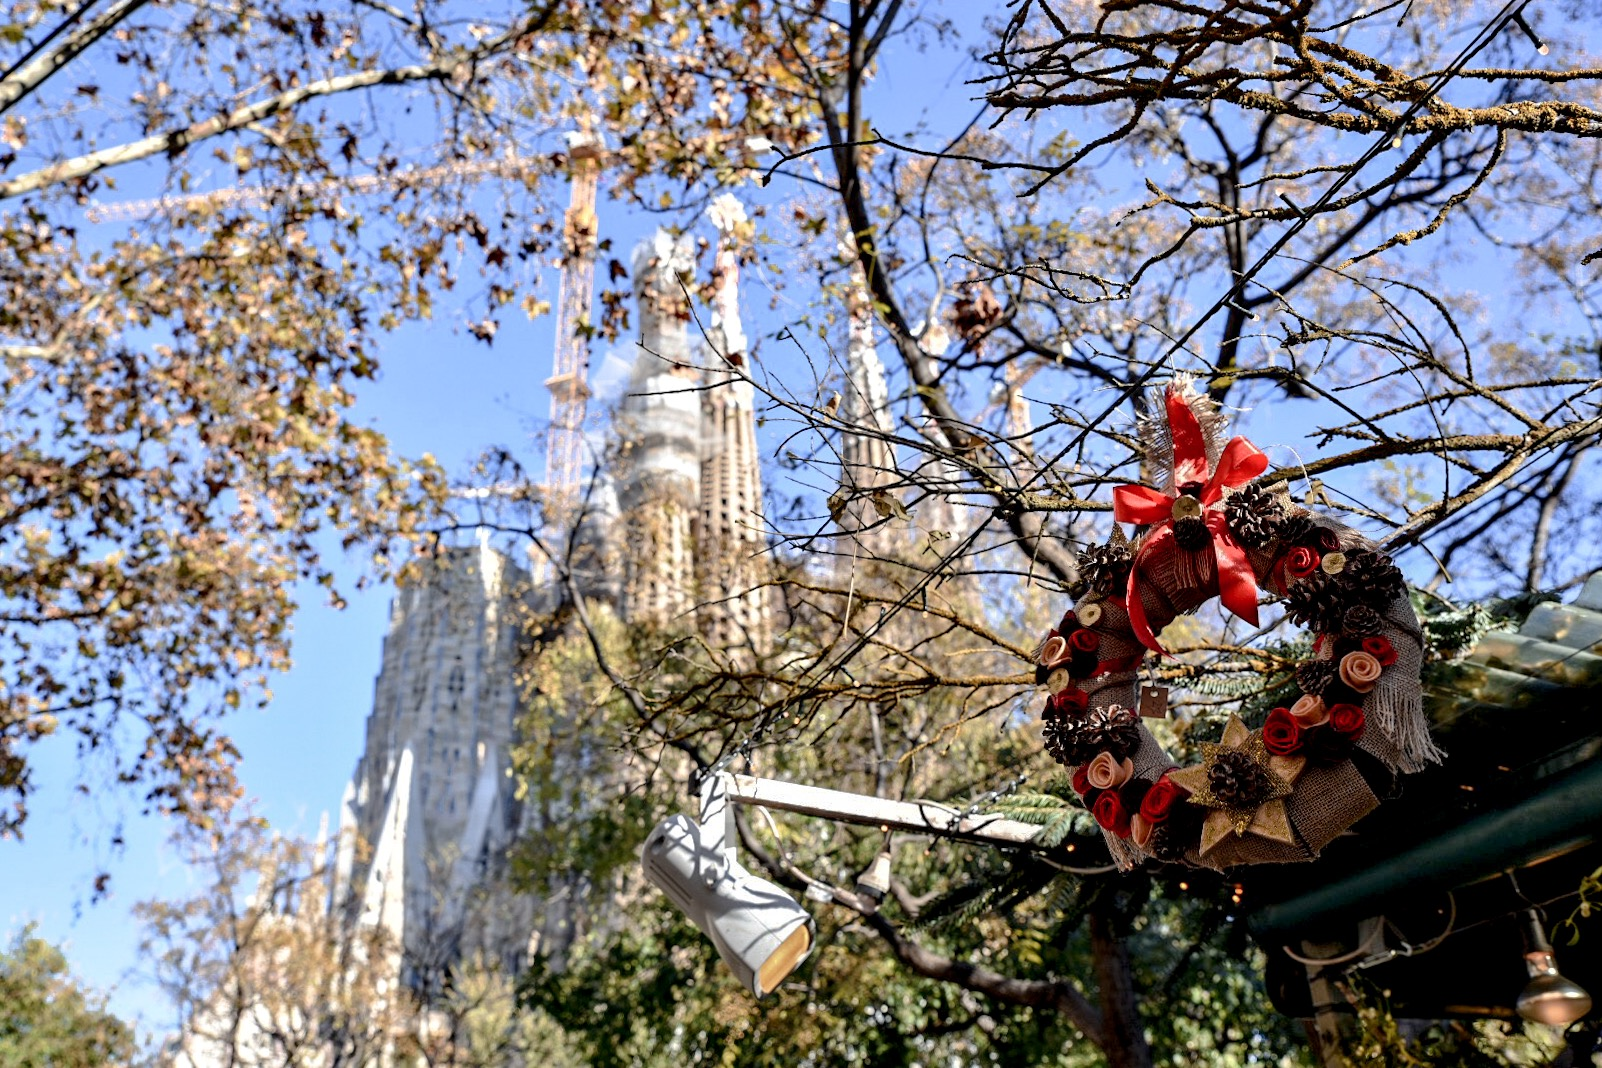 Churro stand at Fira de la Sagrada Familia Christmas Market